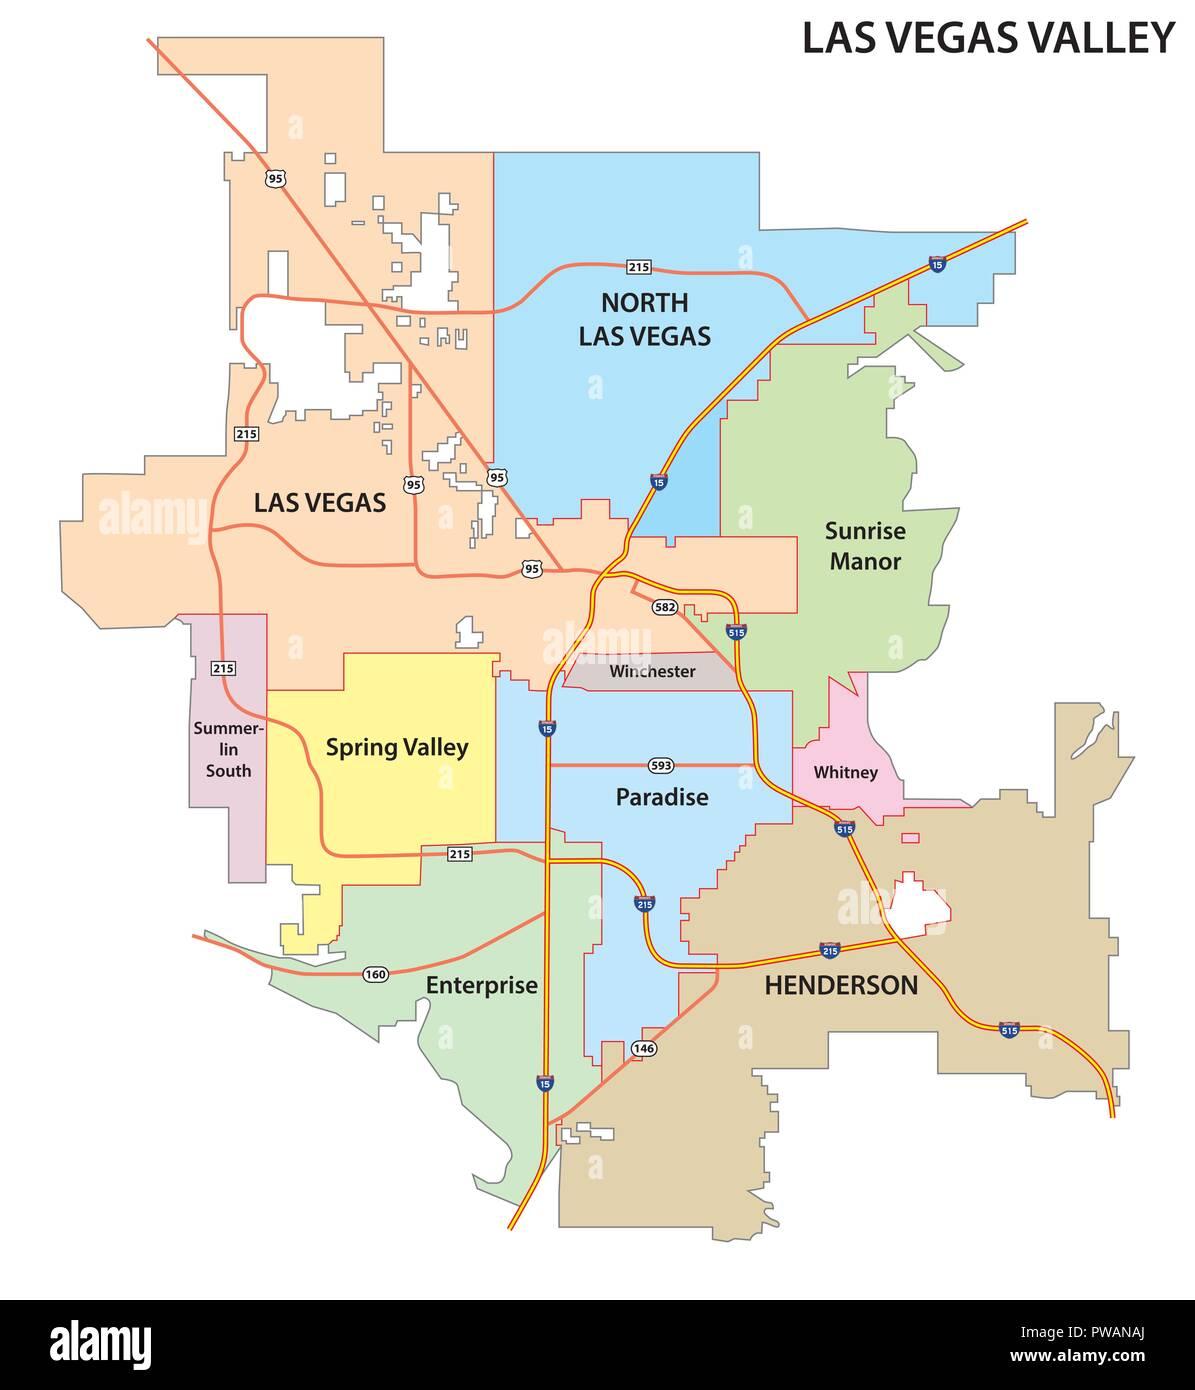 Las Vegas Valley Road Und Administrative Karte Vektor Abbildung